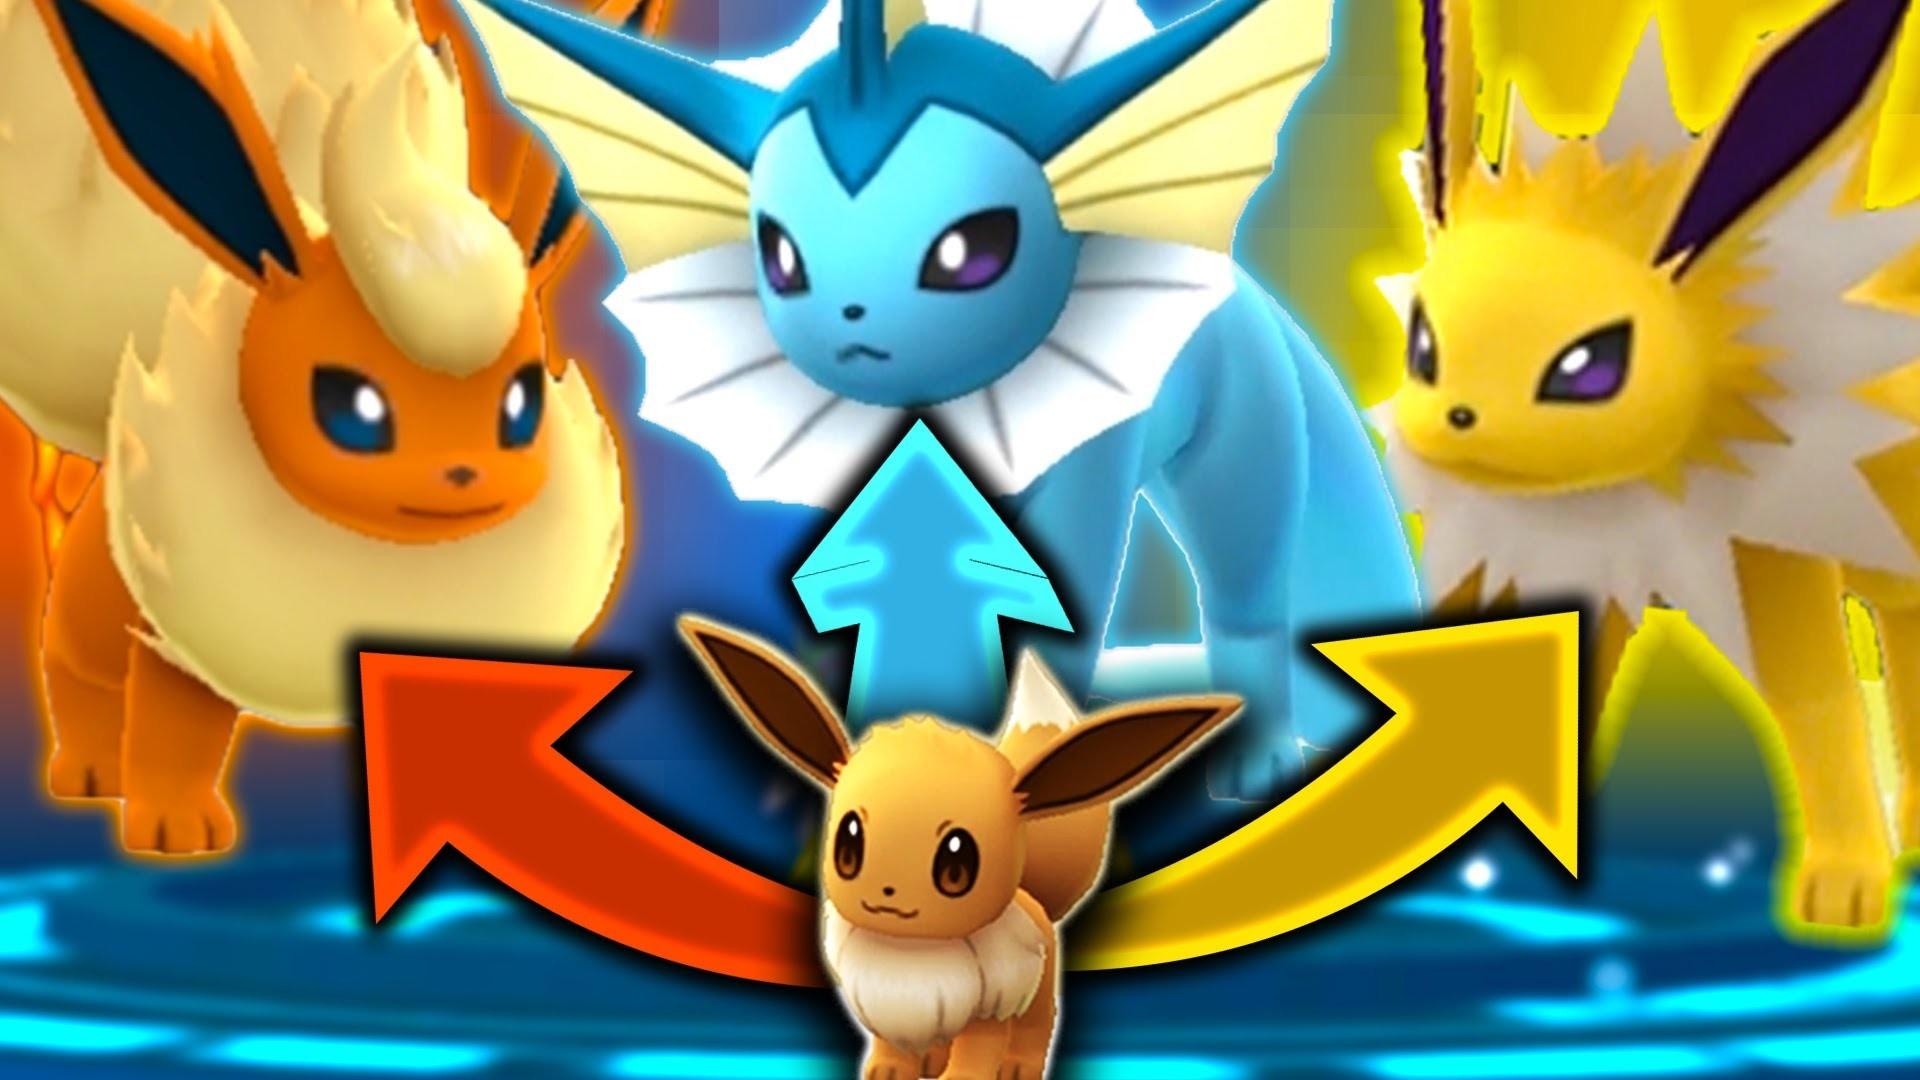 Pokemon Go How To Evolve Eevee into a Vaporeon Jolteon or Flareon – YouTube